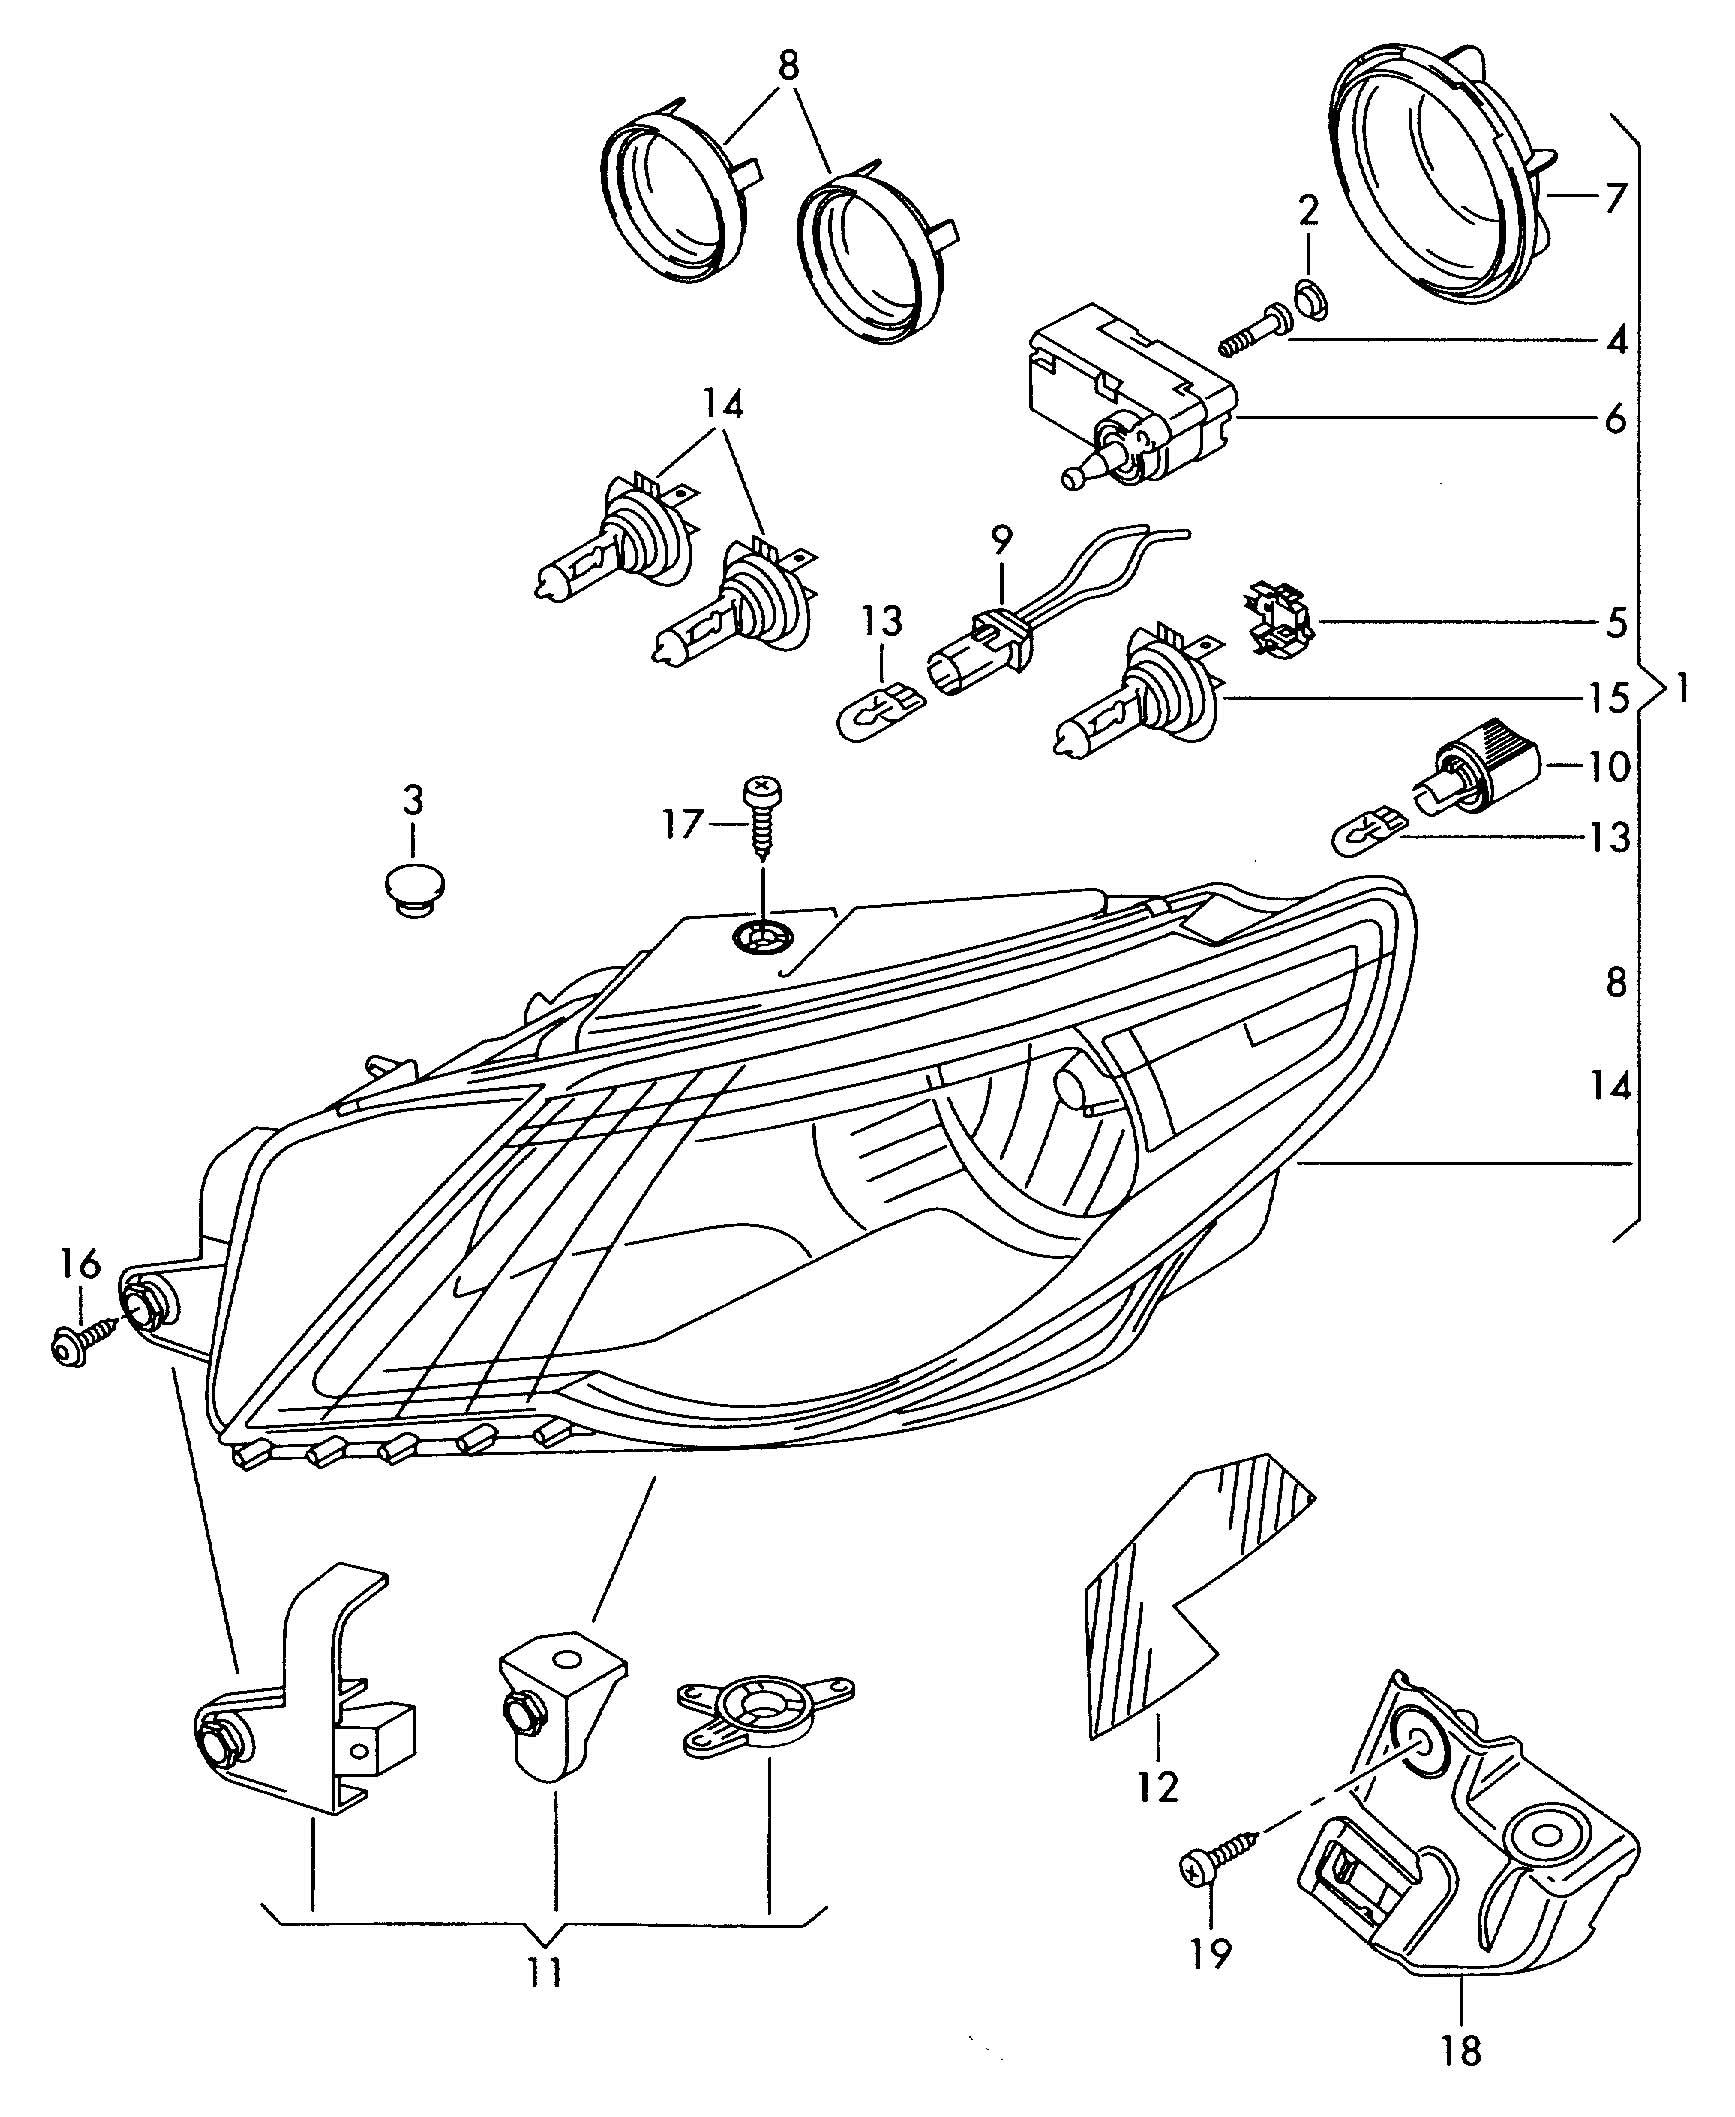 rsx engine diagram of 03